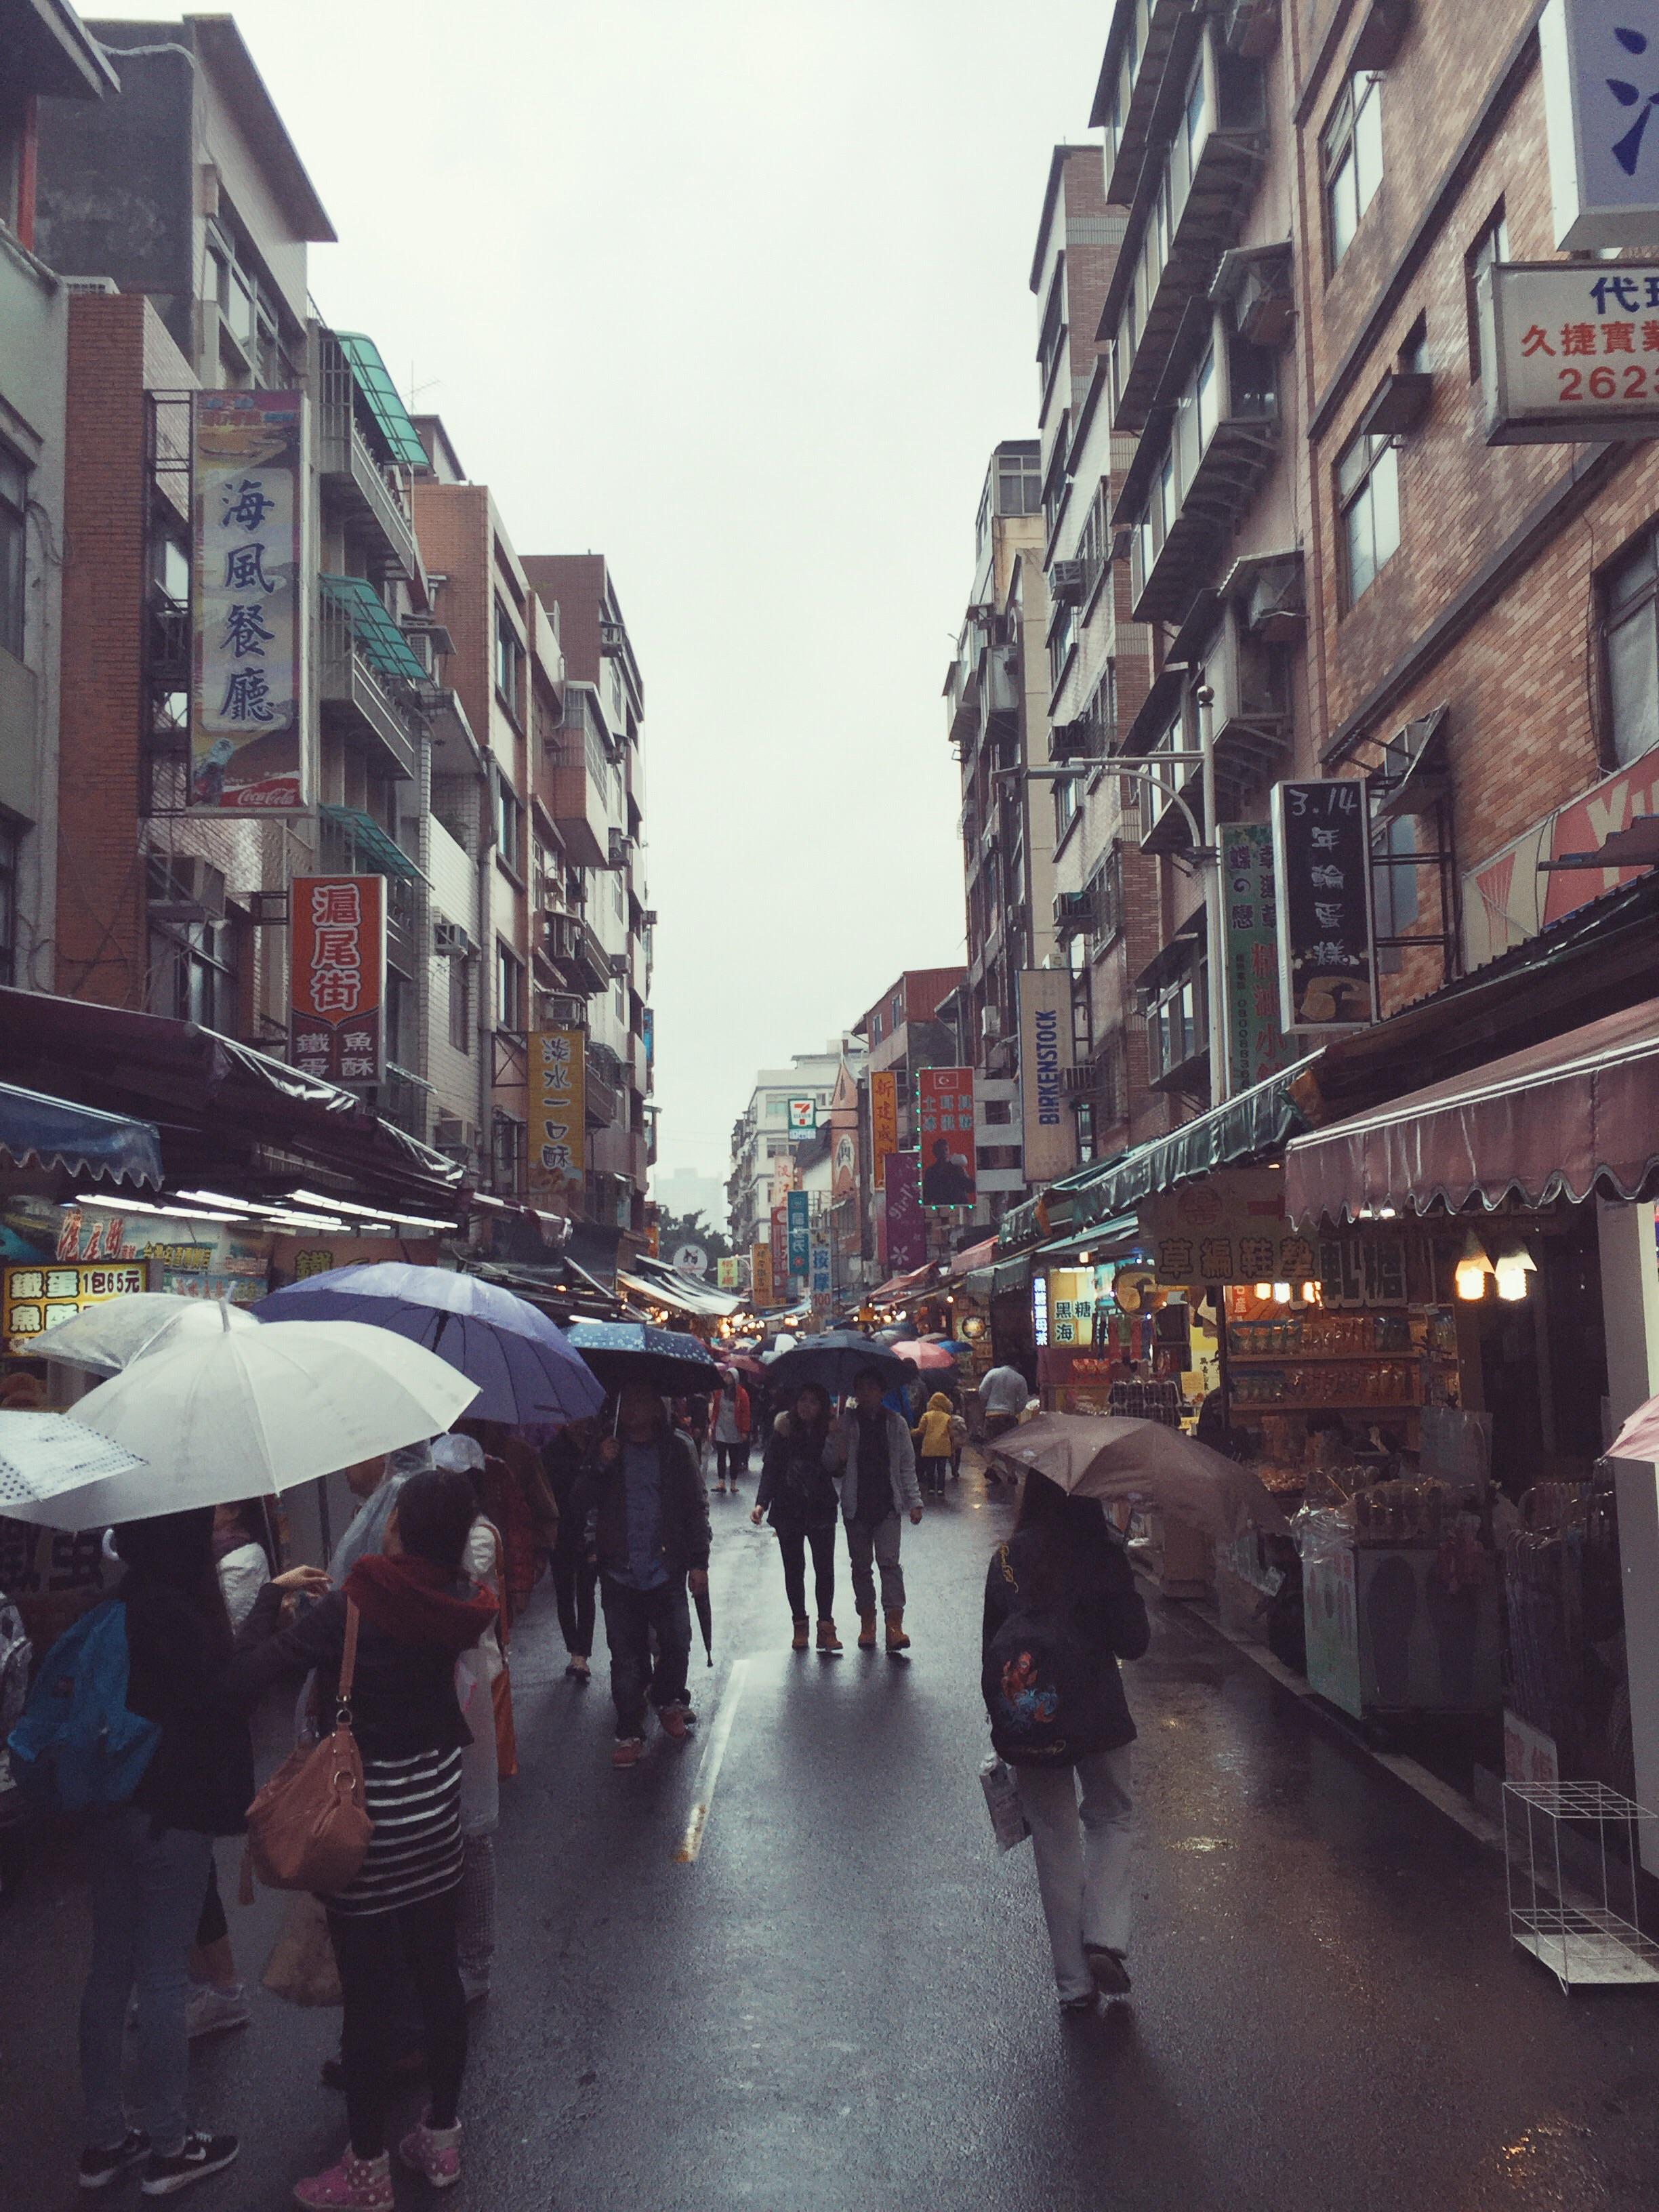 Taipei was mostly gloomy and raining.